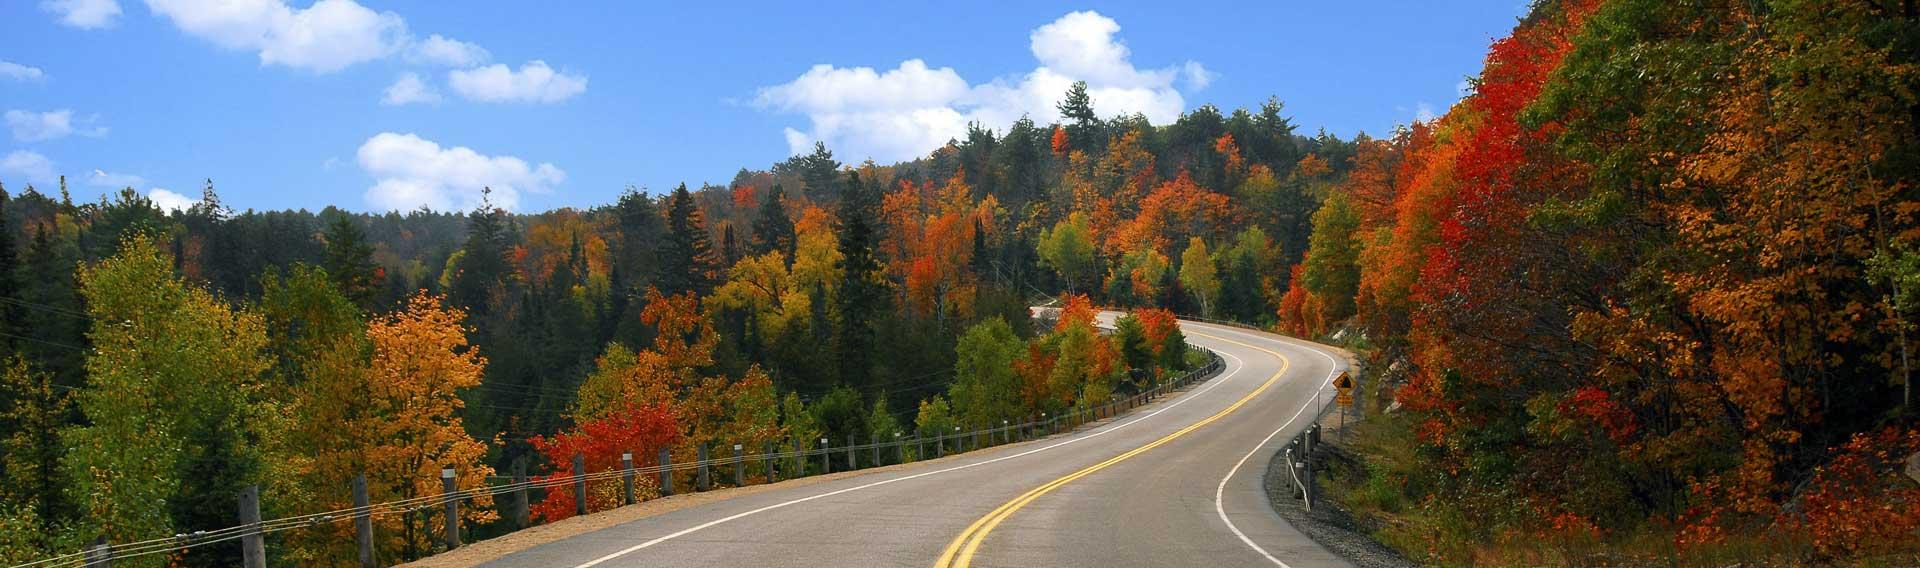 Voyage et Roadtrip au Canada